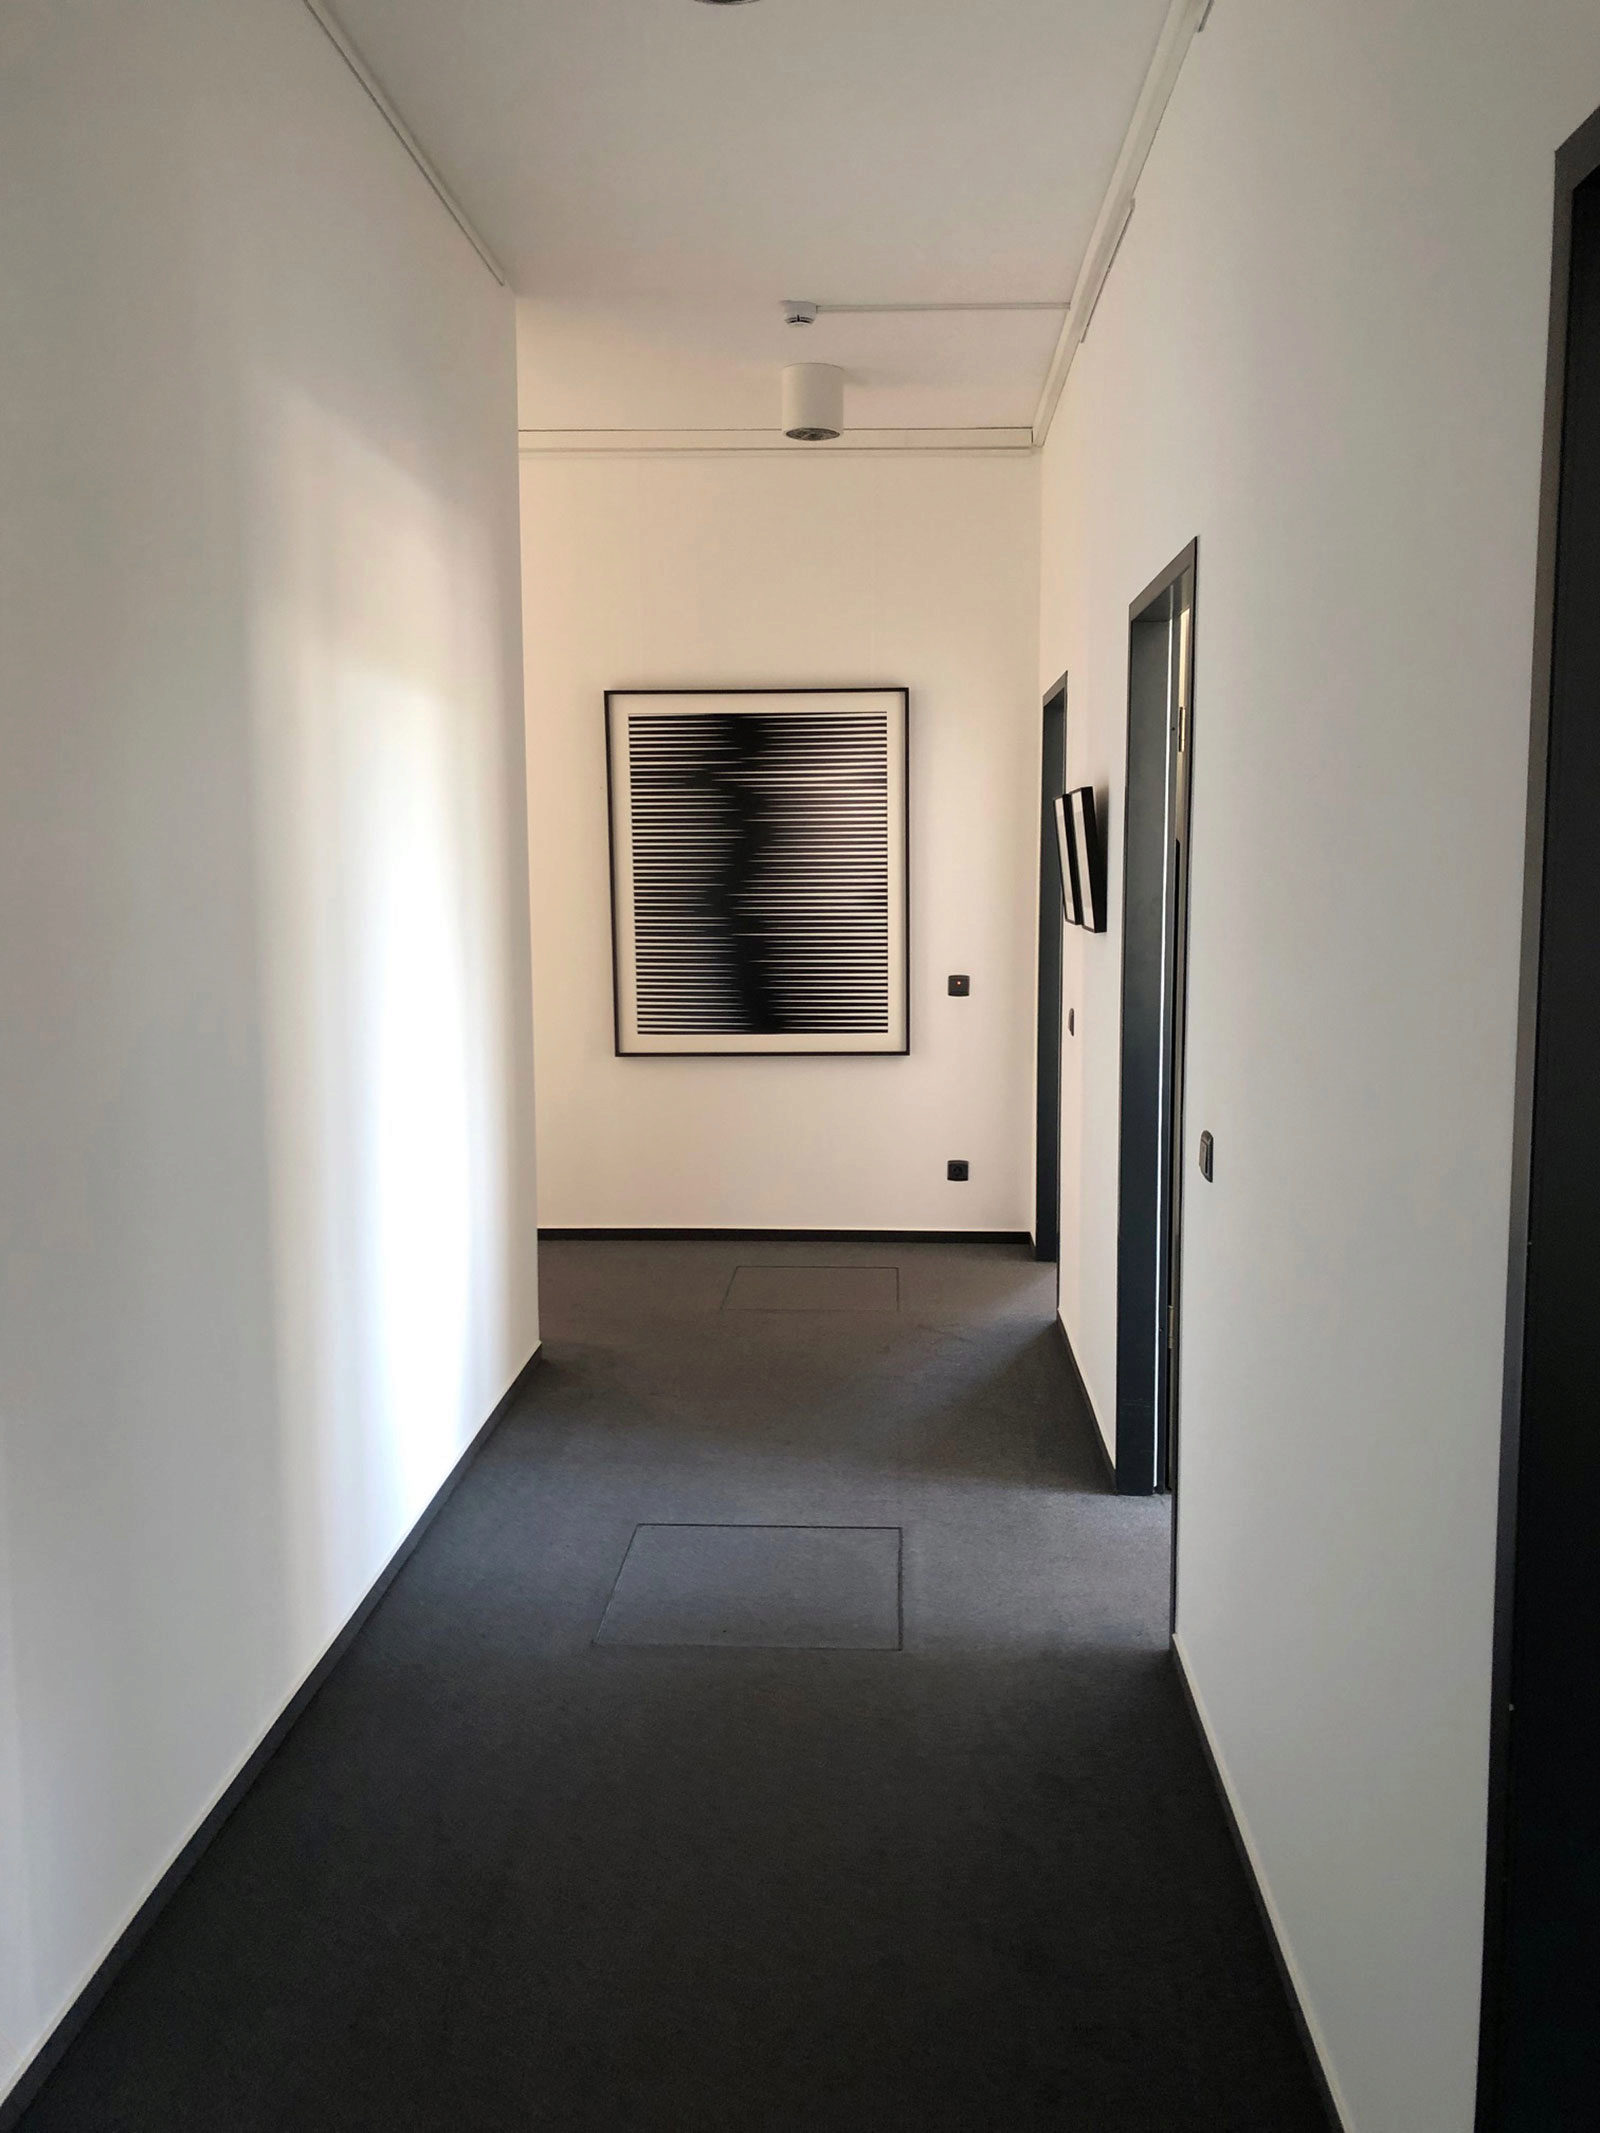 Gallery Item Image